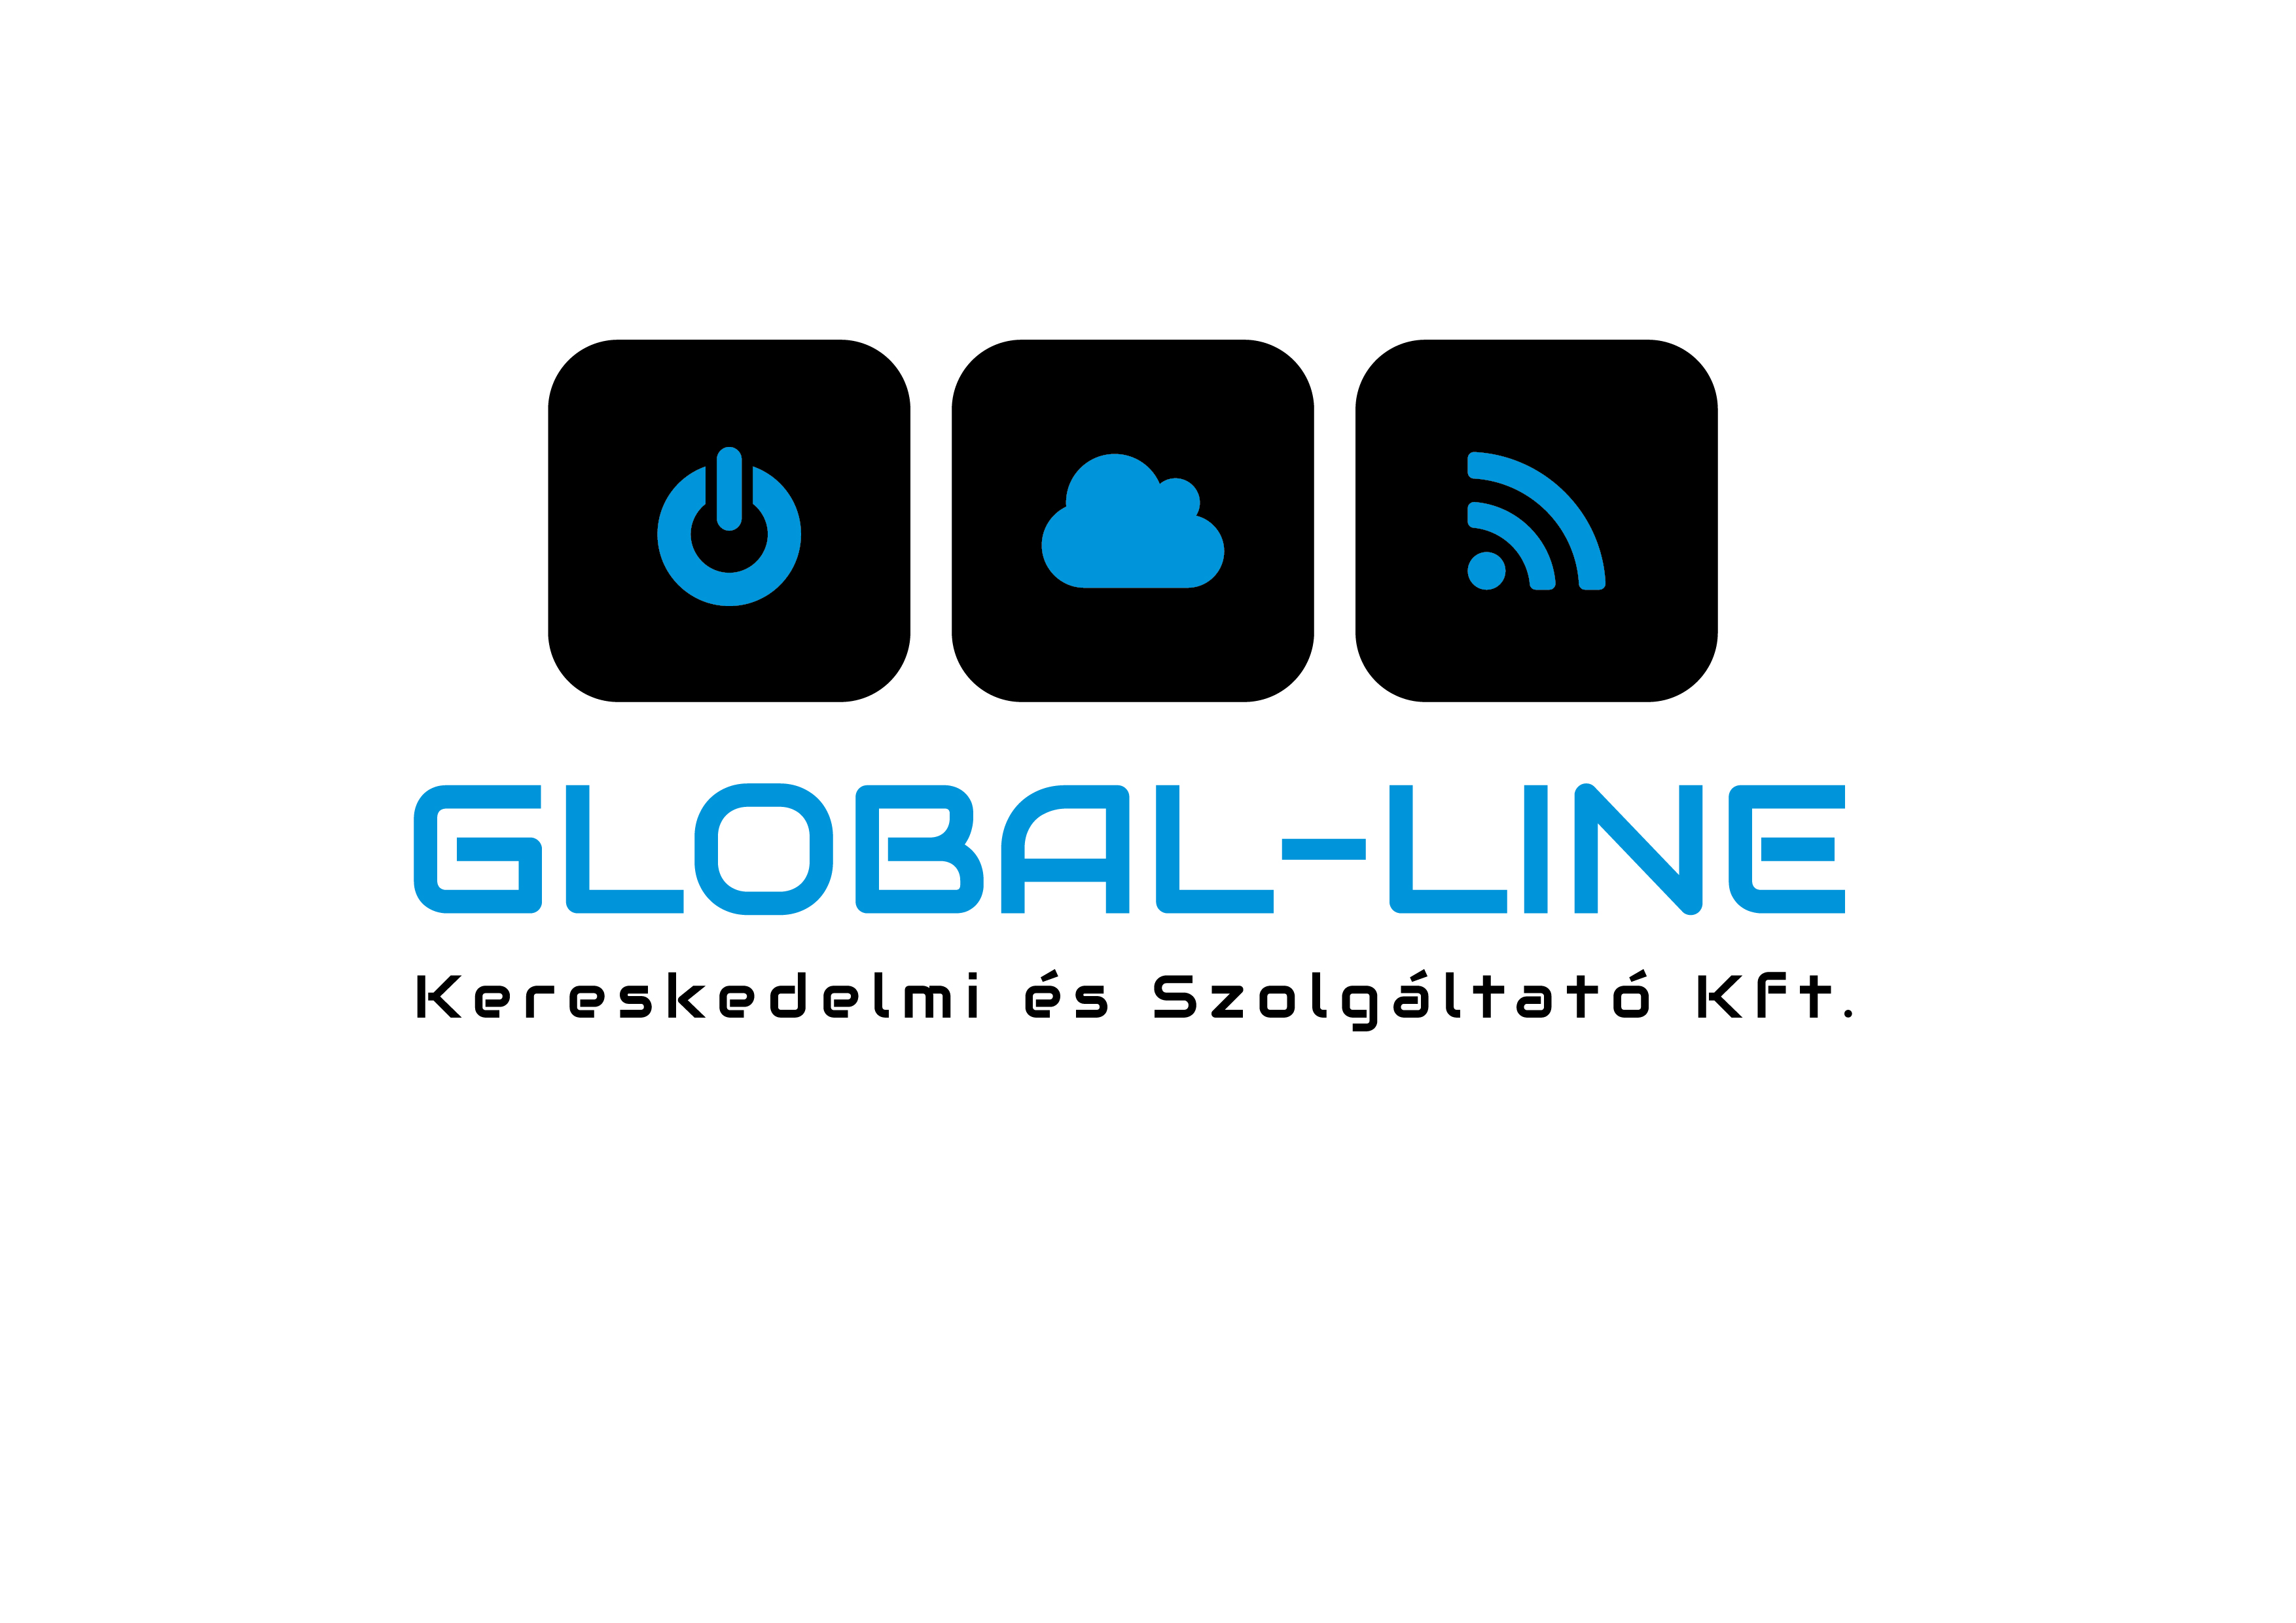 Global-Line Kft.